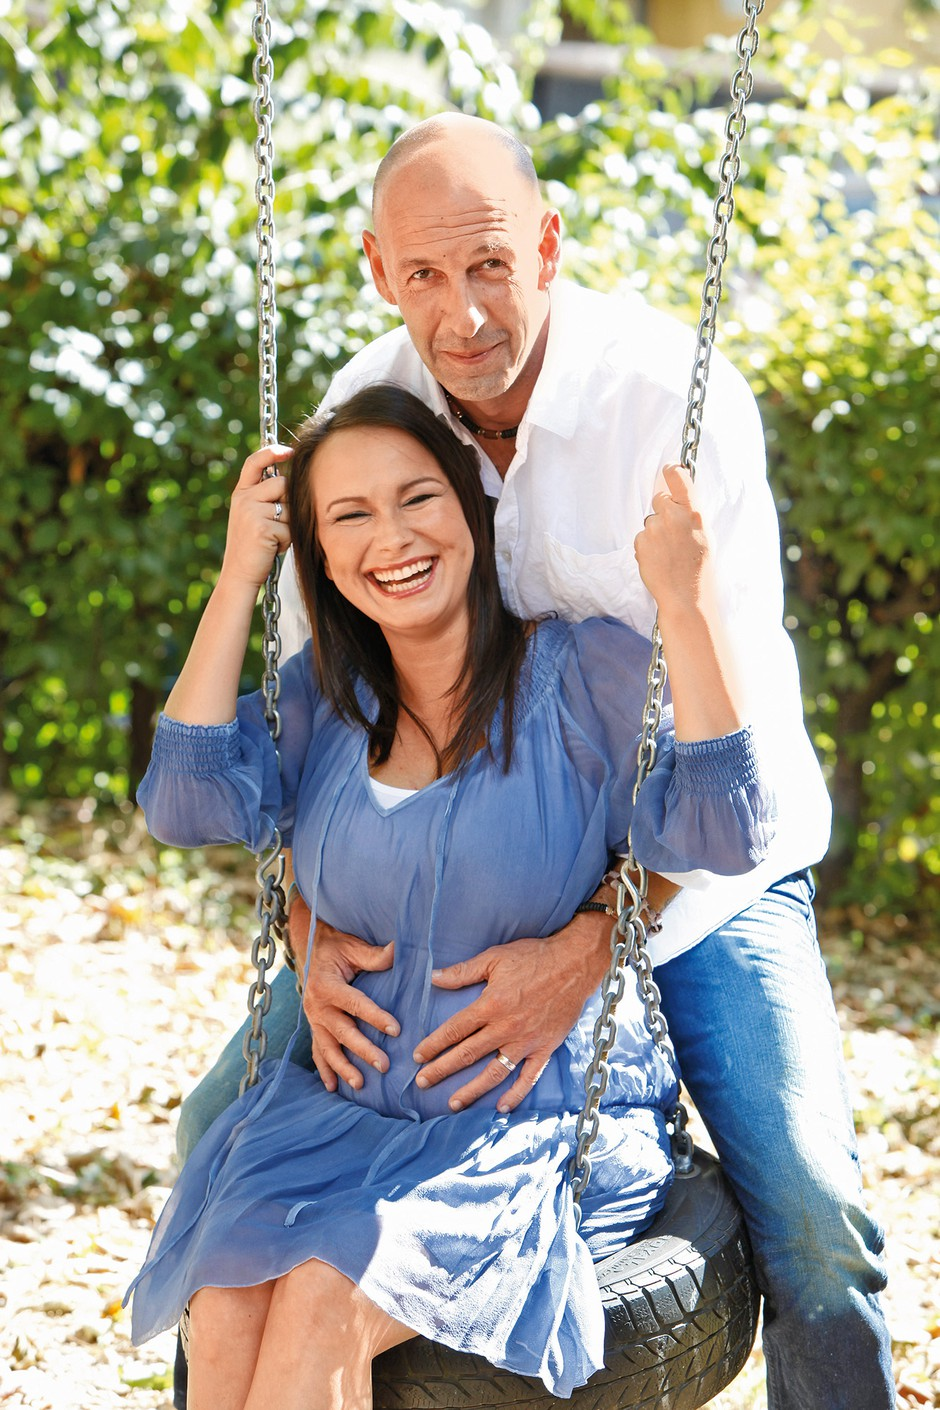 Jože je znova postal očka. Z ženo Doris sta dobila deklico Suri. (foto: Lea Press)